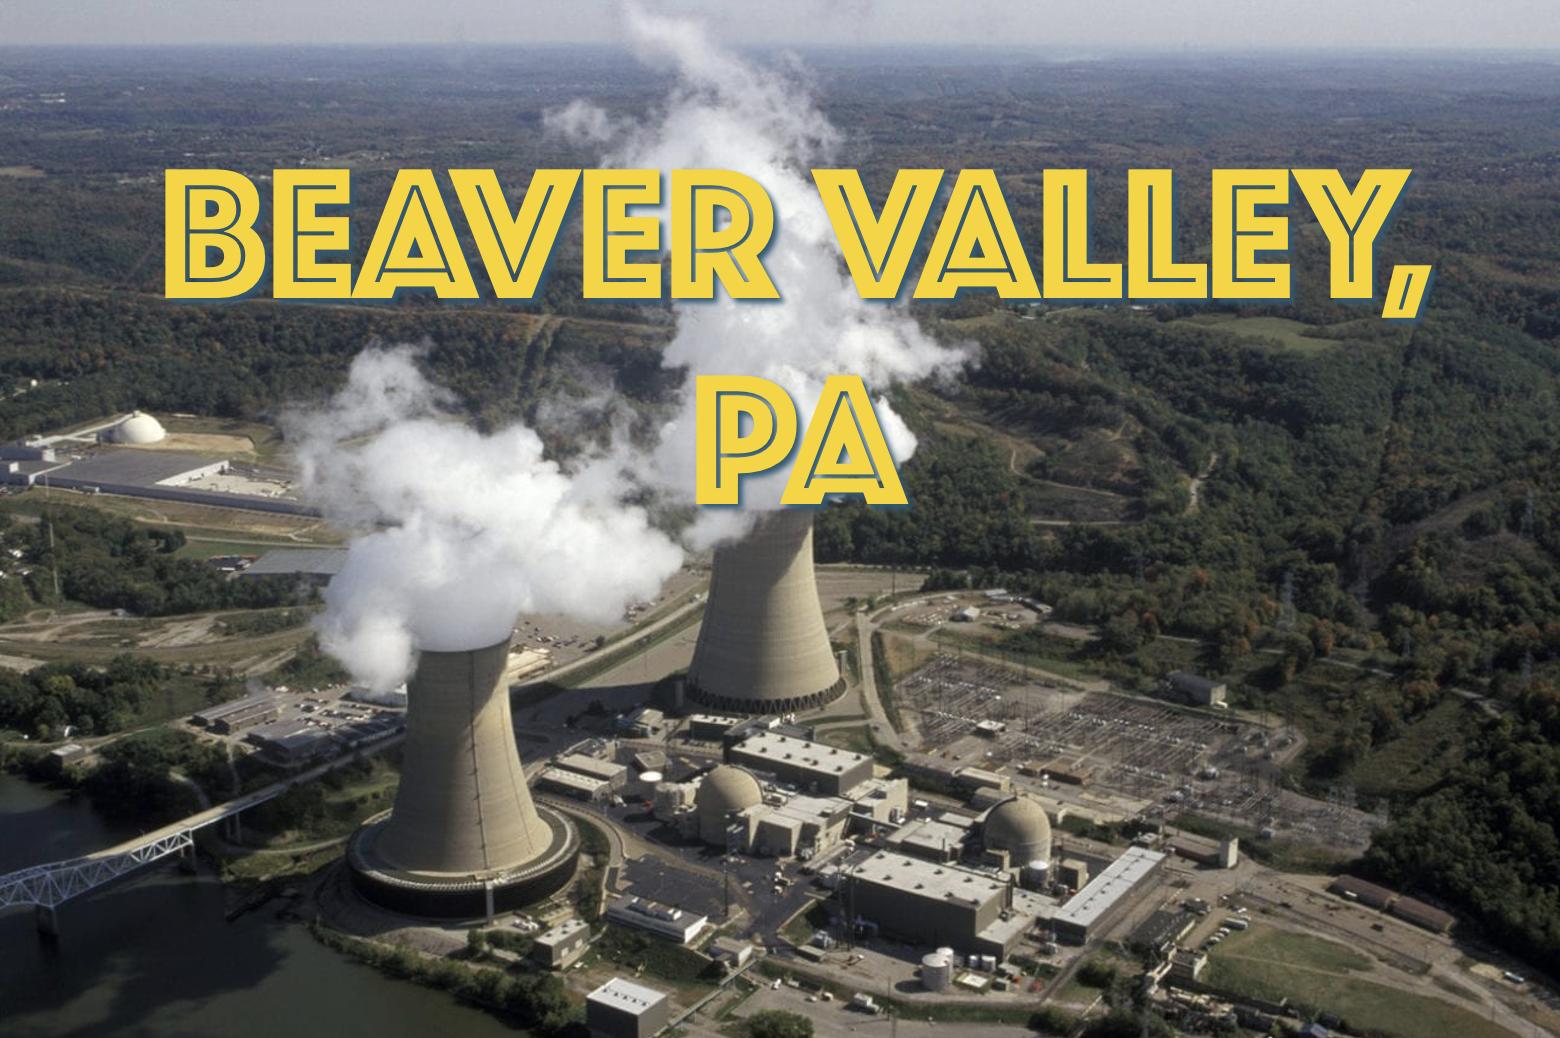 Beaver Valley 1 & 2 (PA)